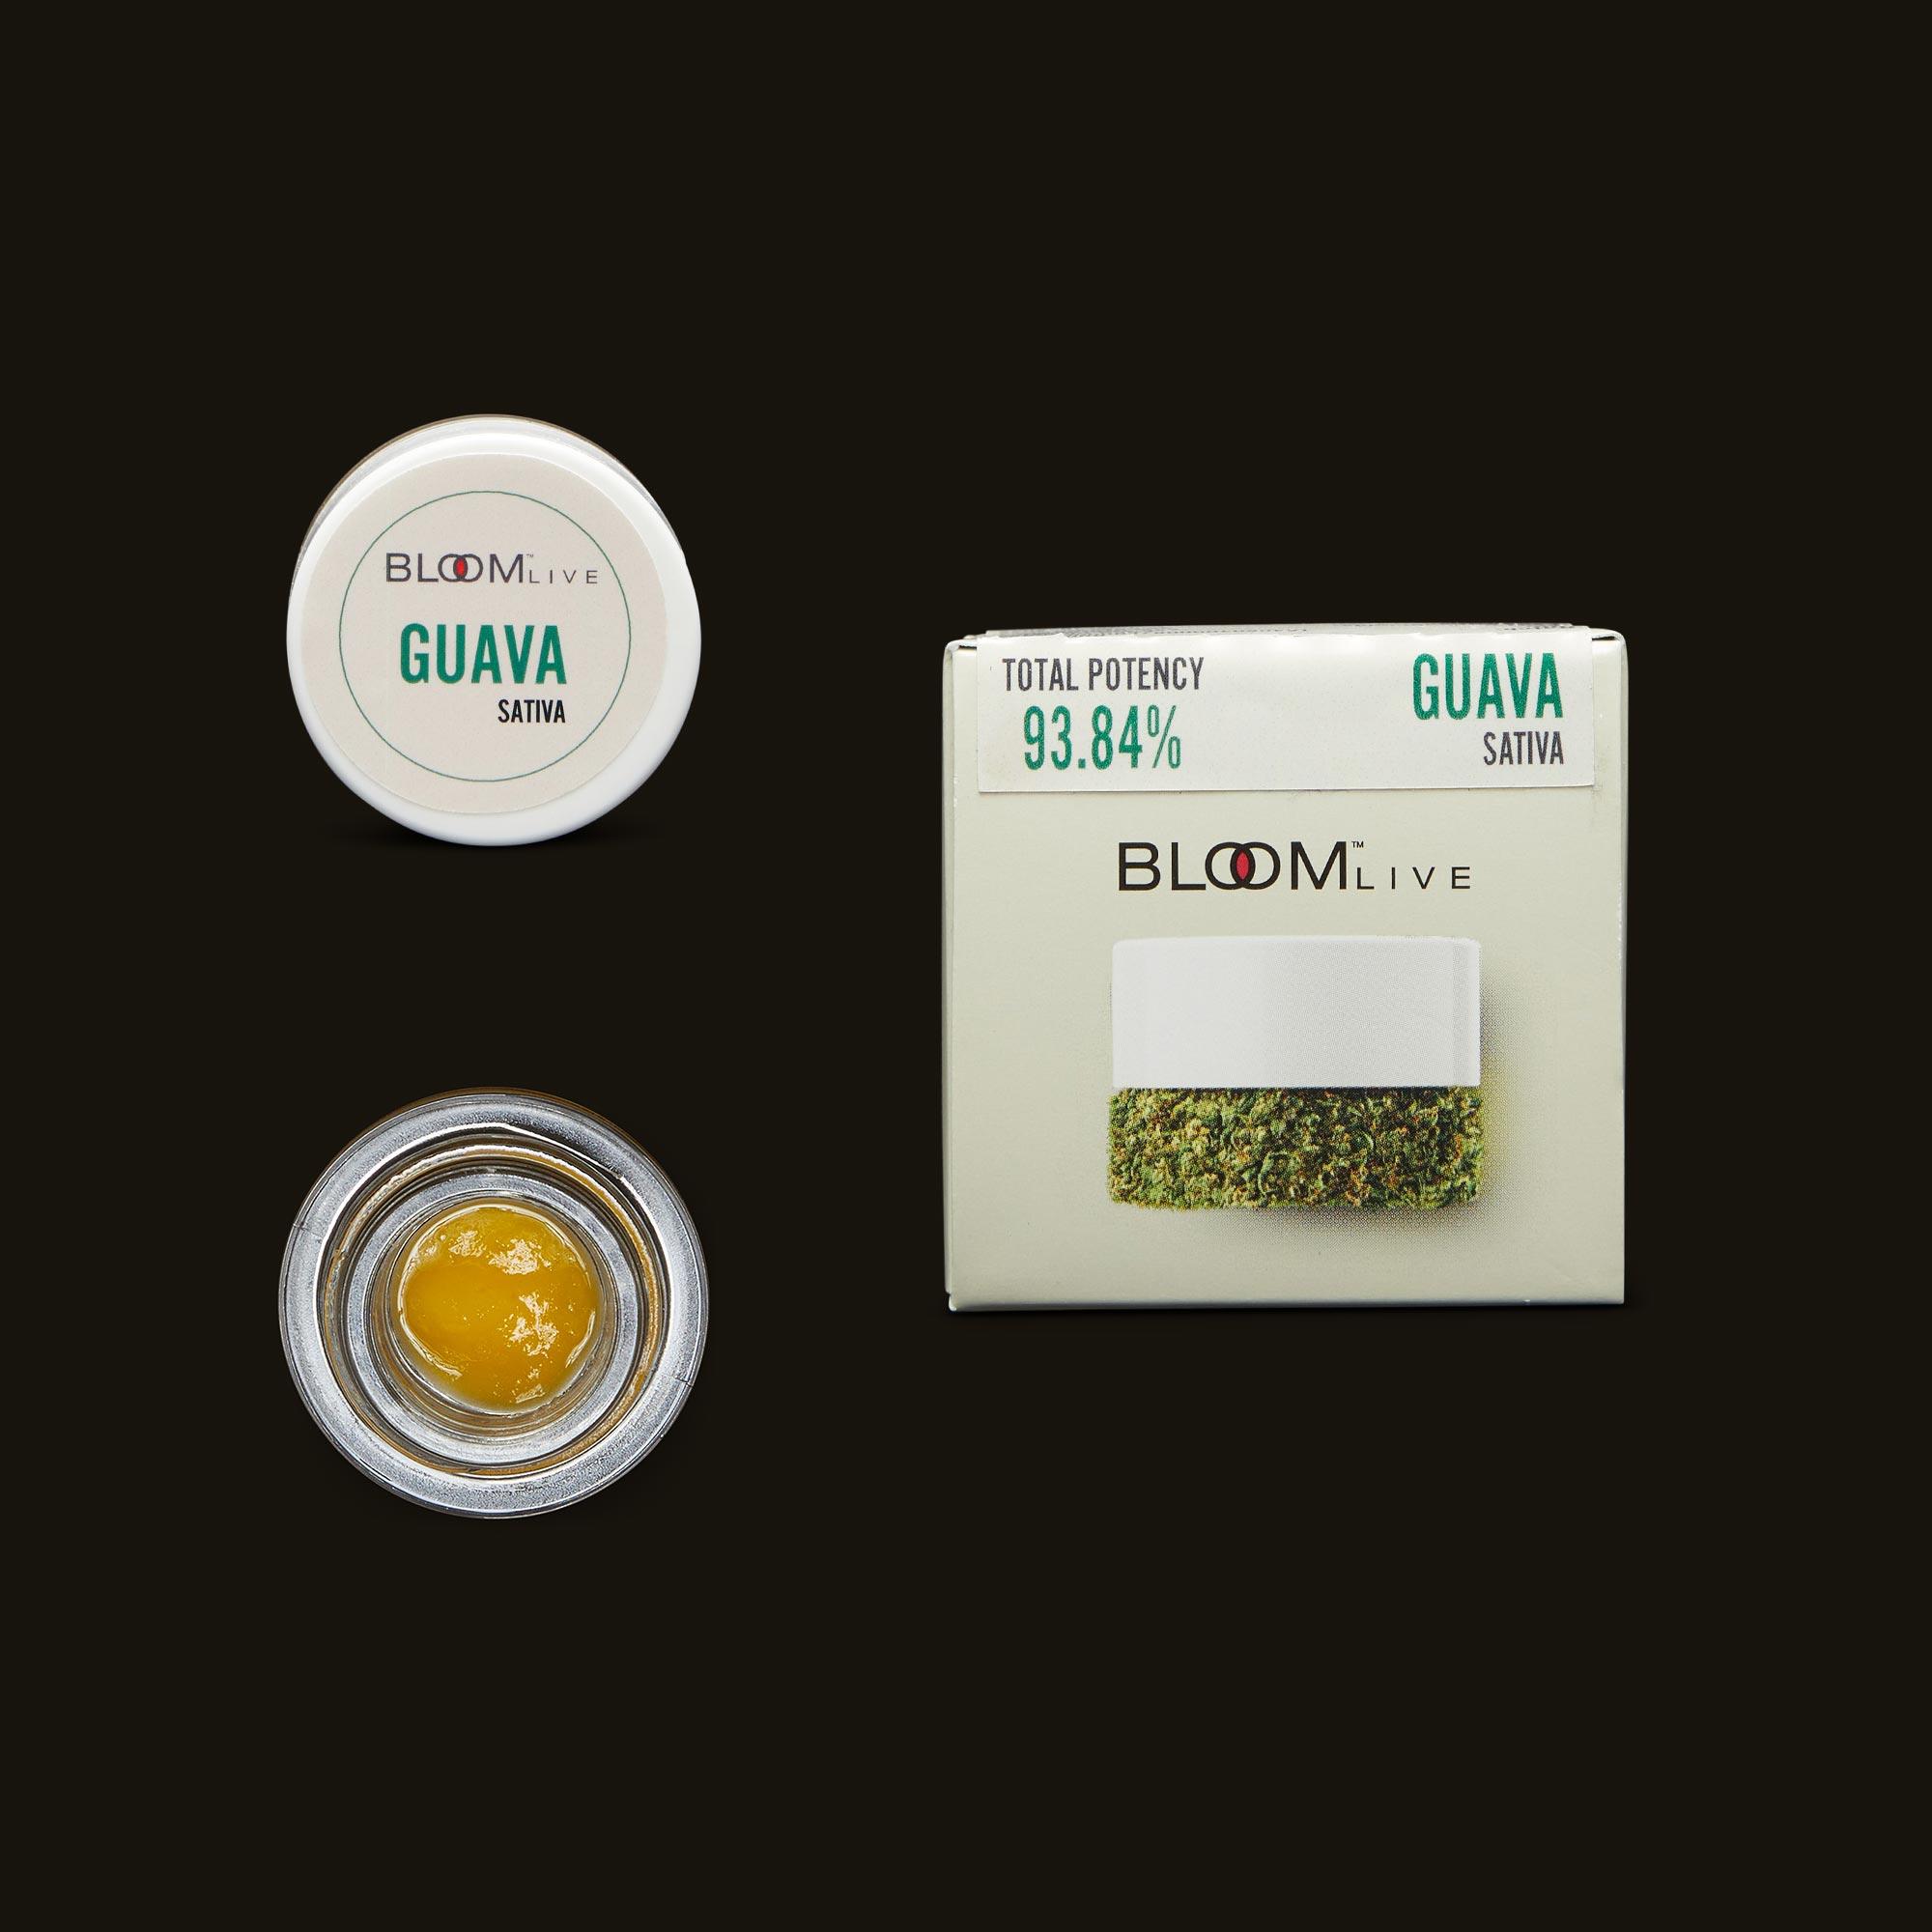 Guava Live Budder by Bloom Brands